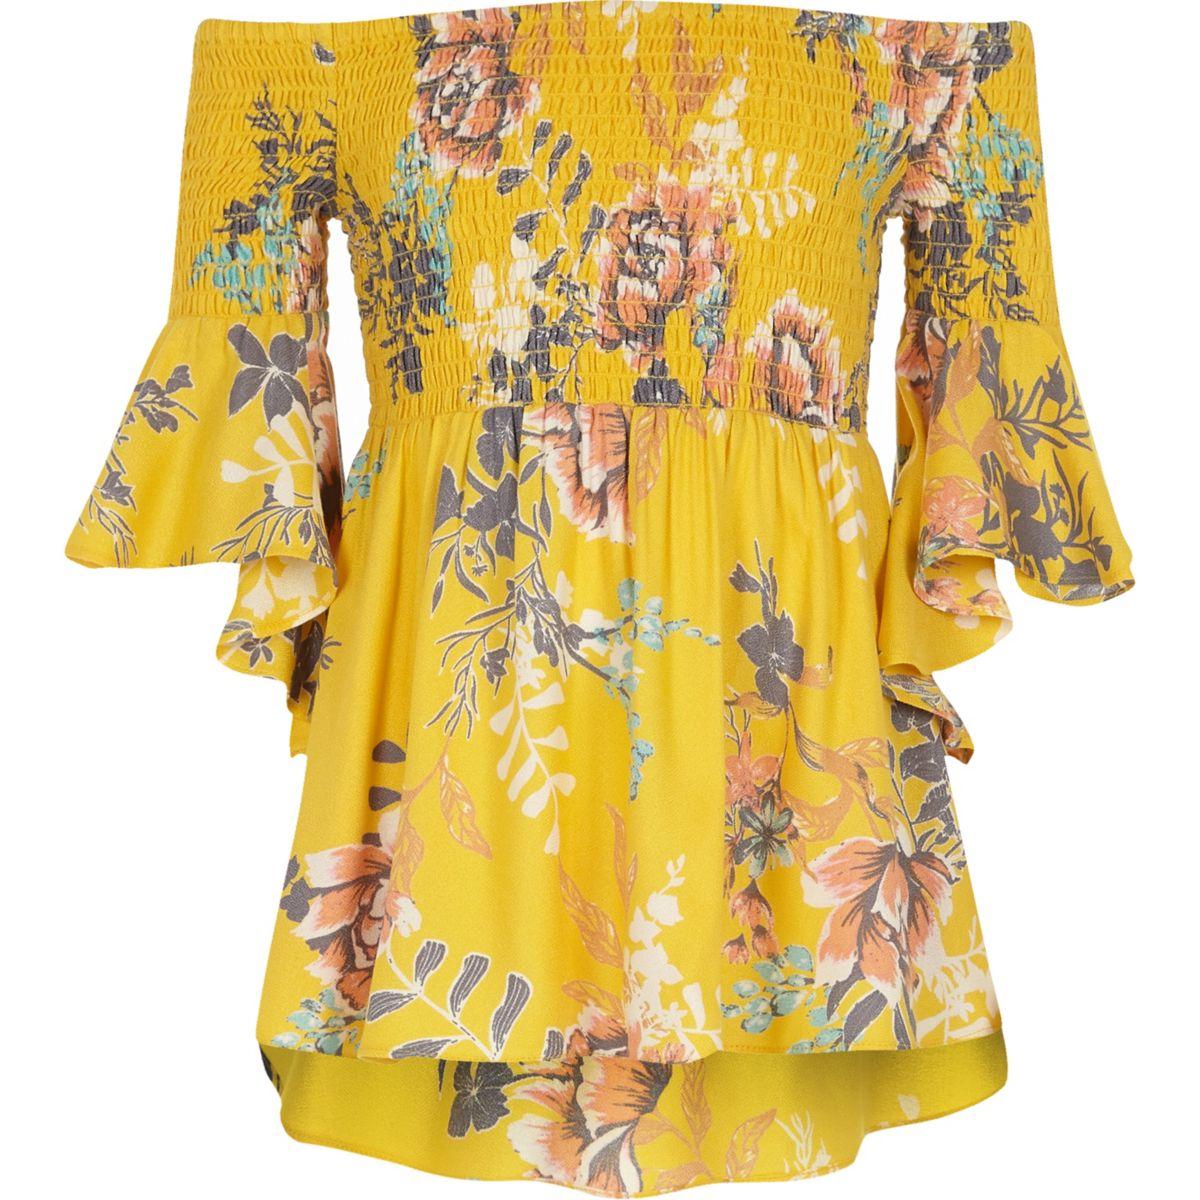 Girls yellow floral shirred bardot top